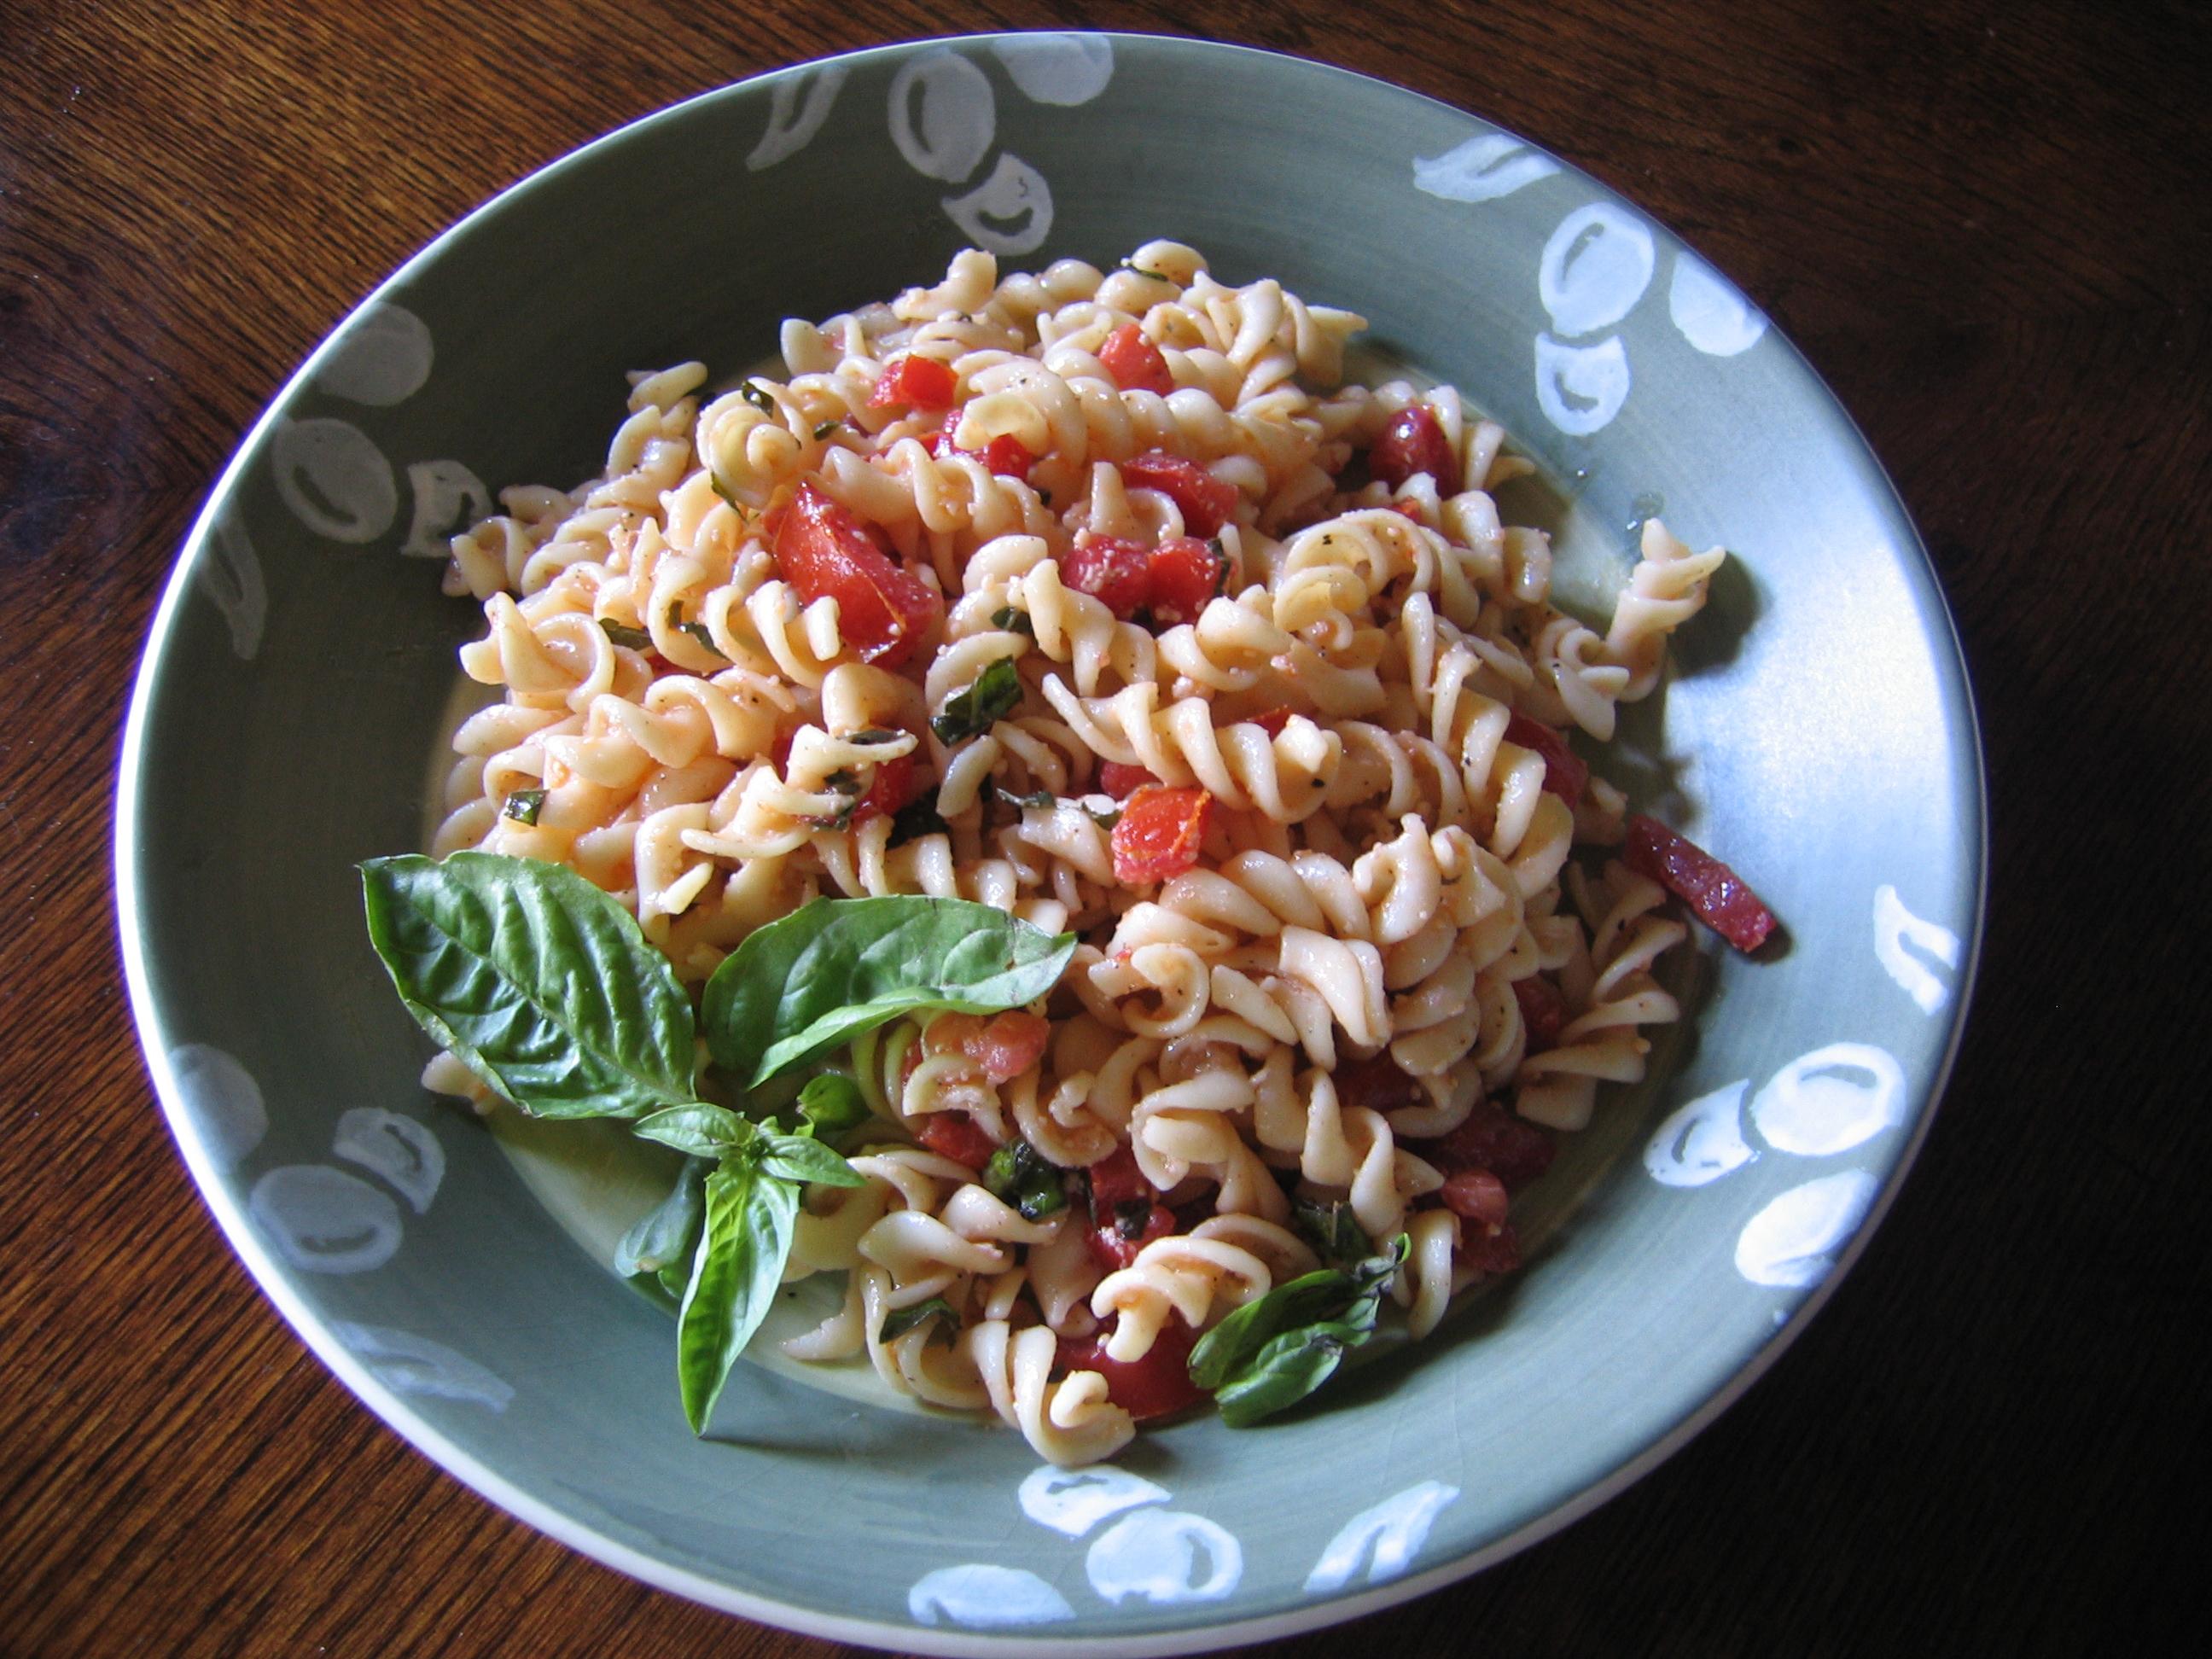 Tomato-Basil Pasta Salad Recipe